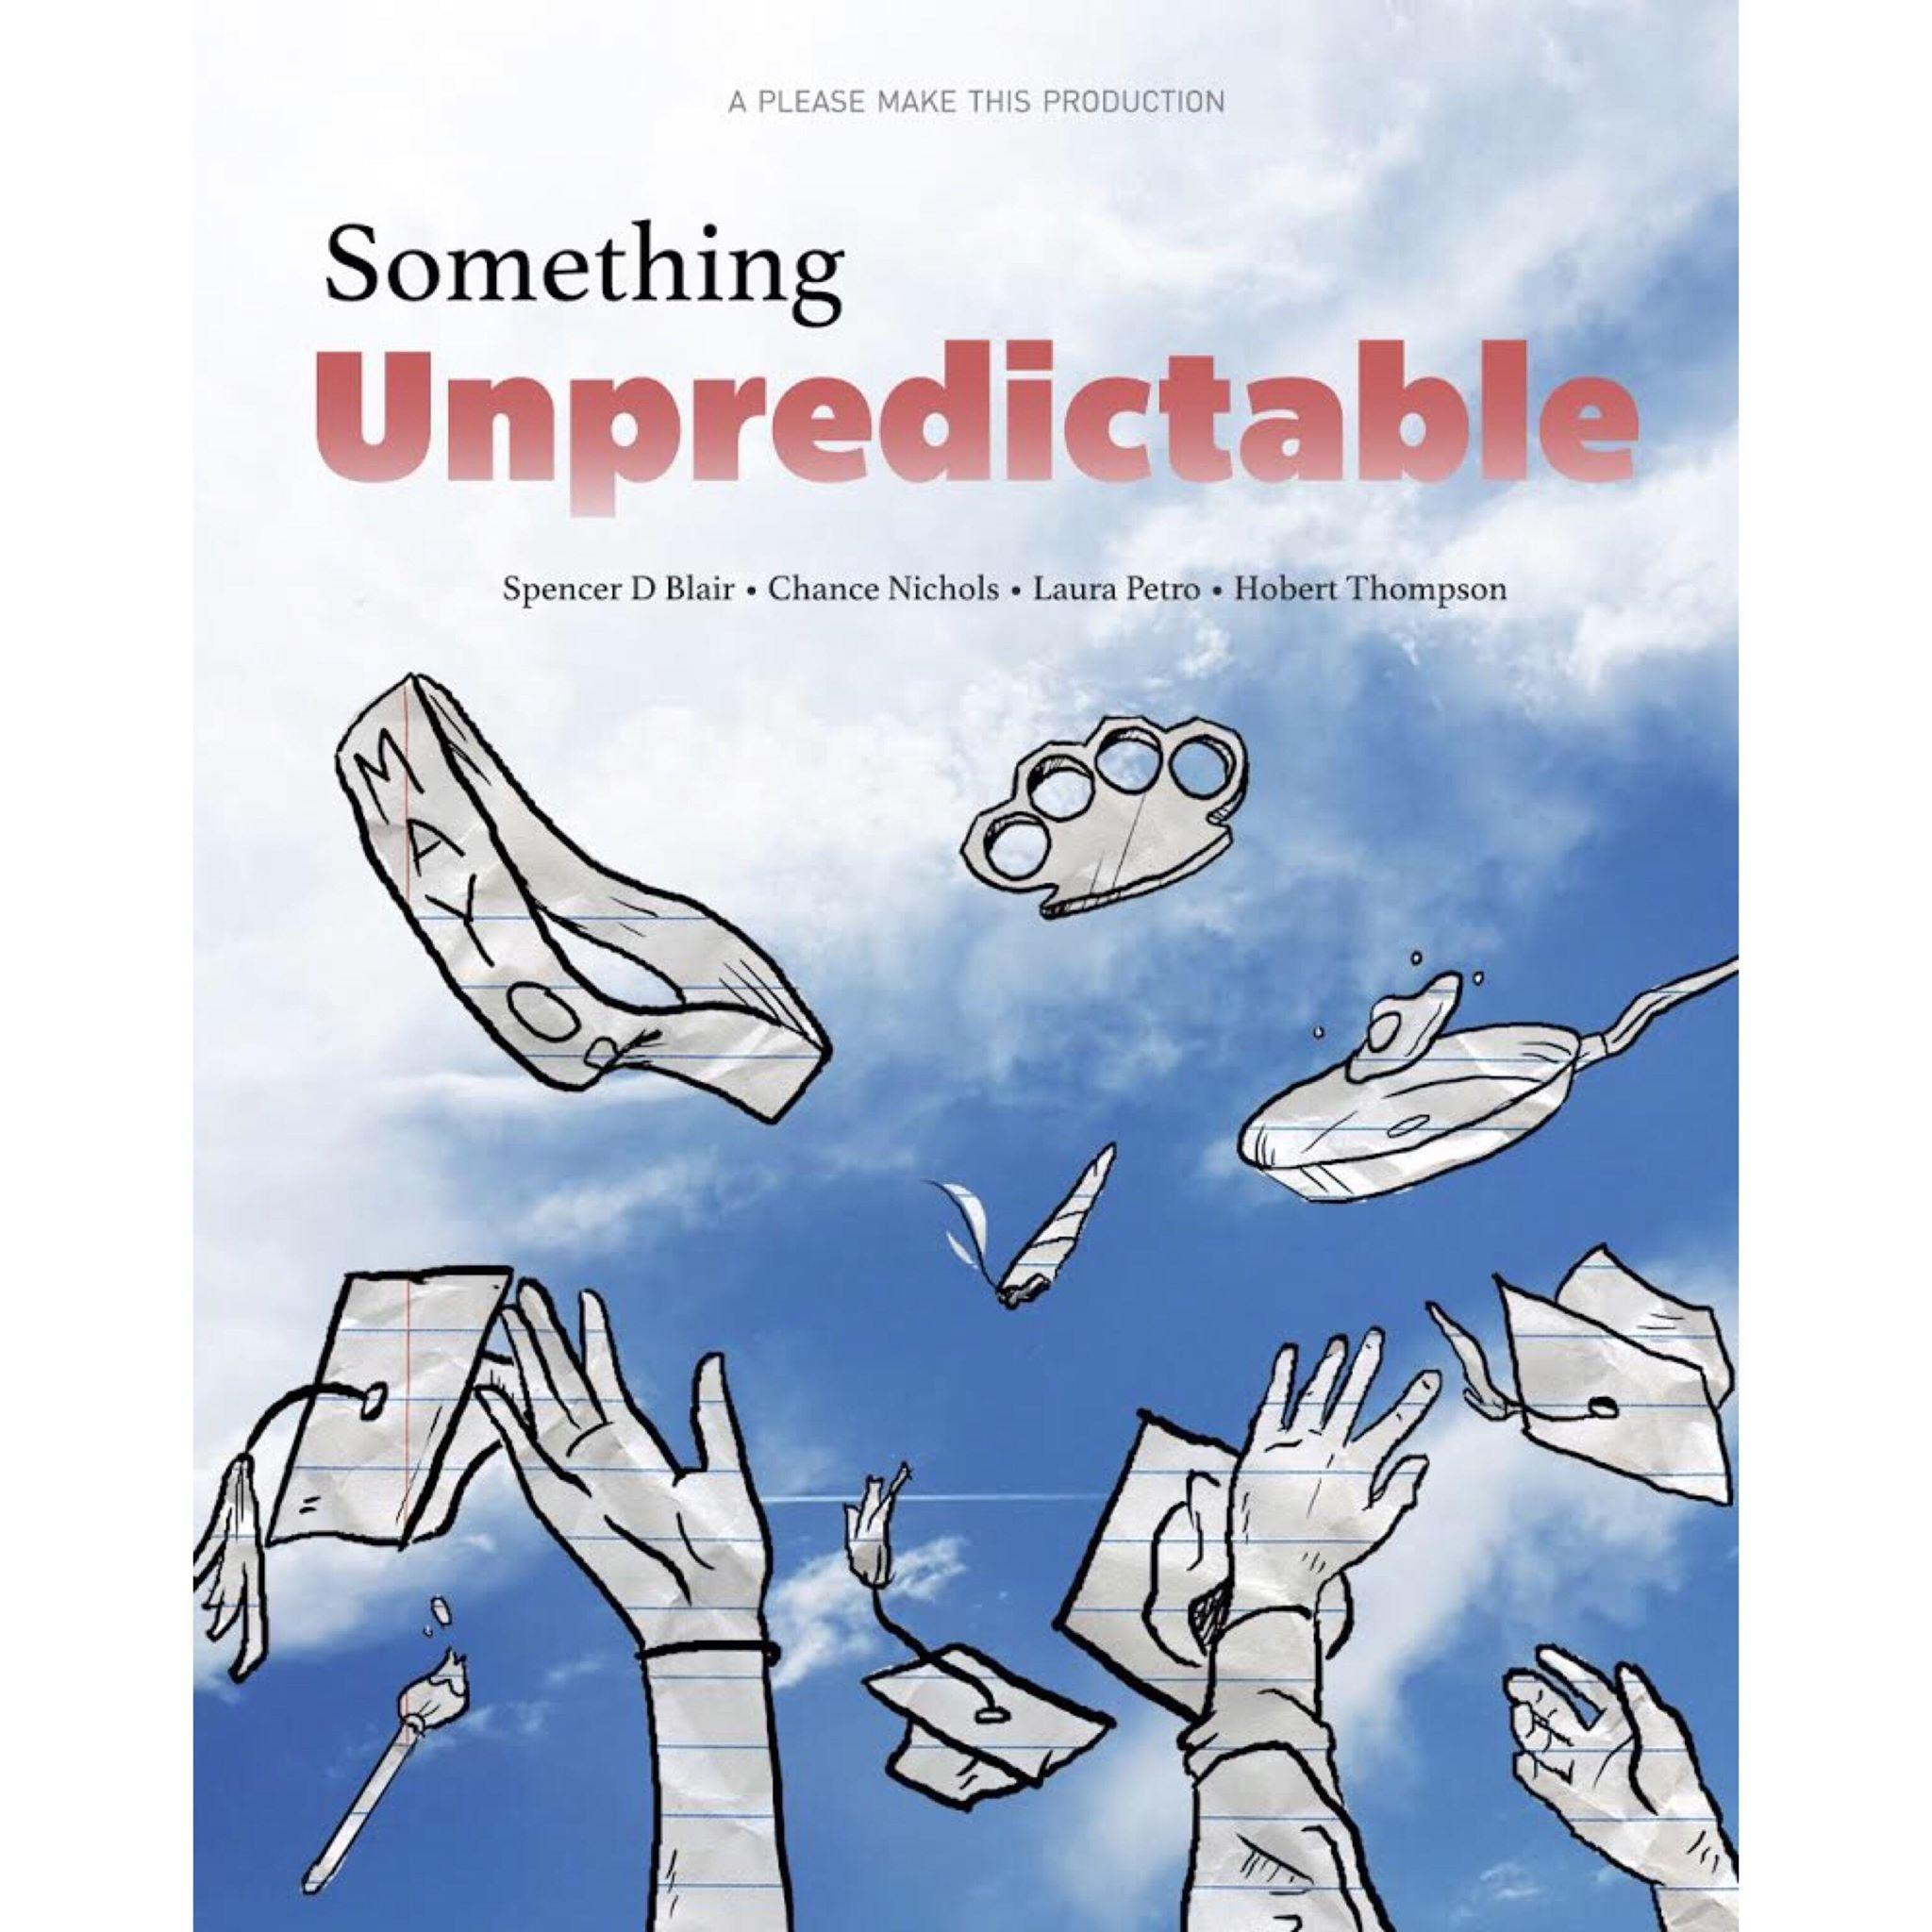 UnpredictableSqusre.jpg